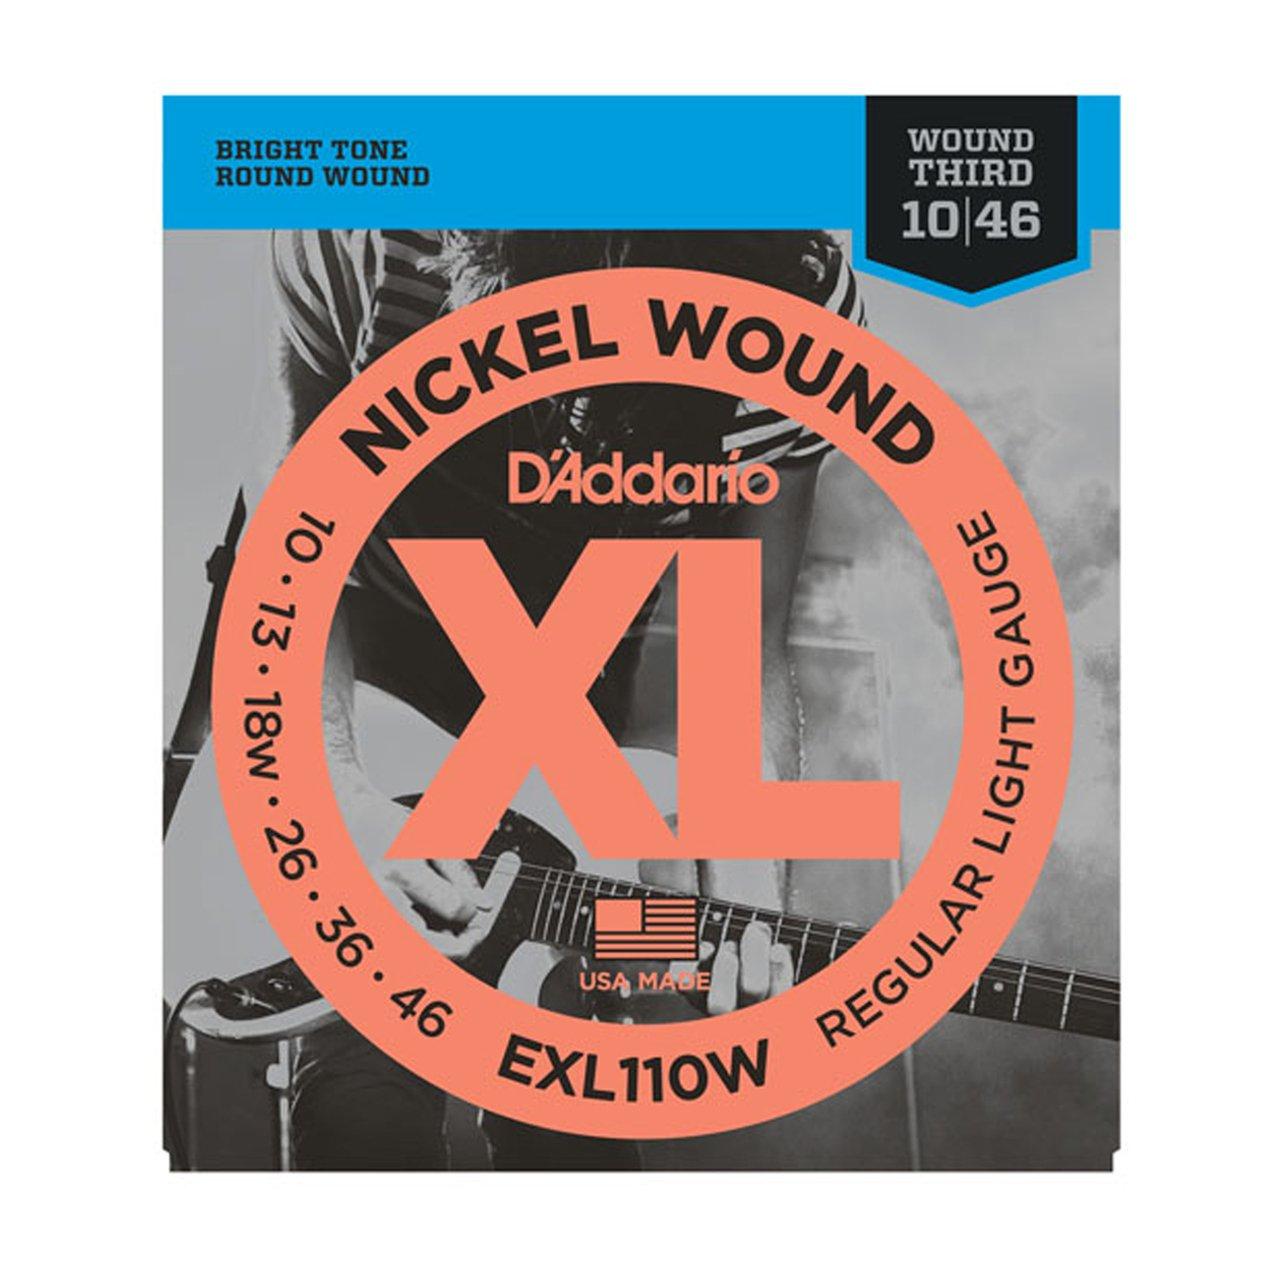 D'Addario EXL110W Nickel Regular Light Electric Guitar Strings - Wound 3rd